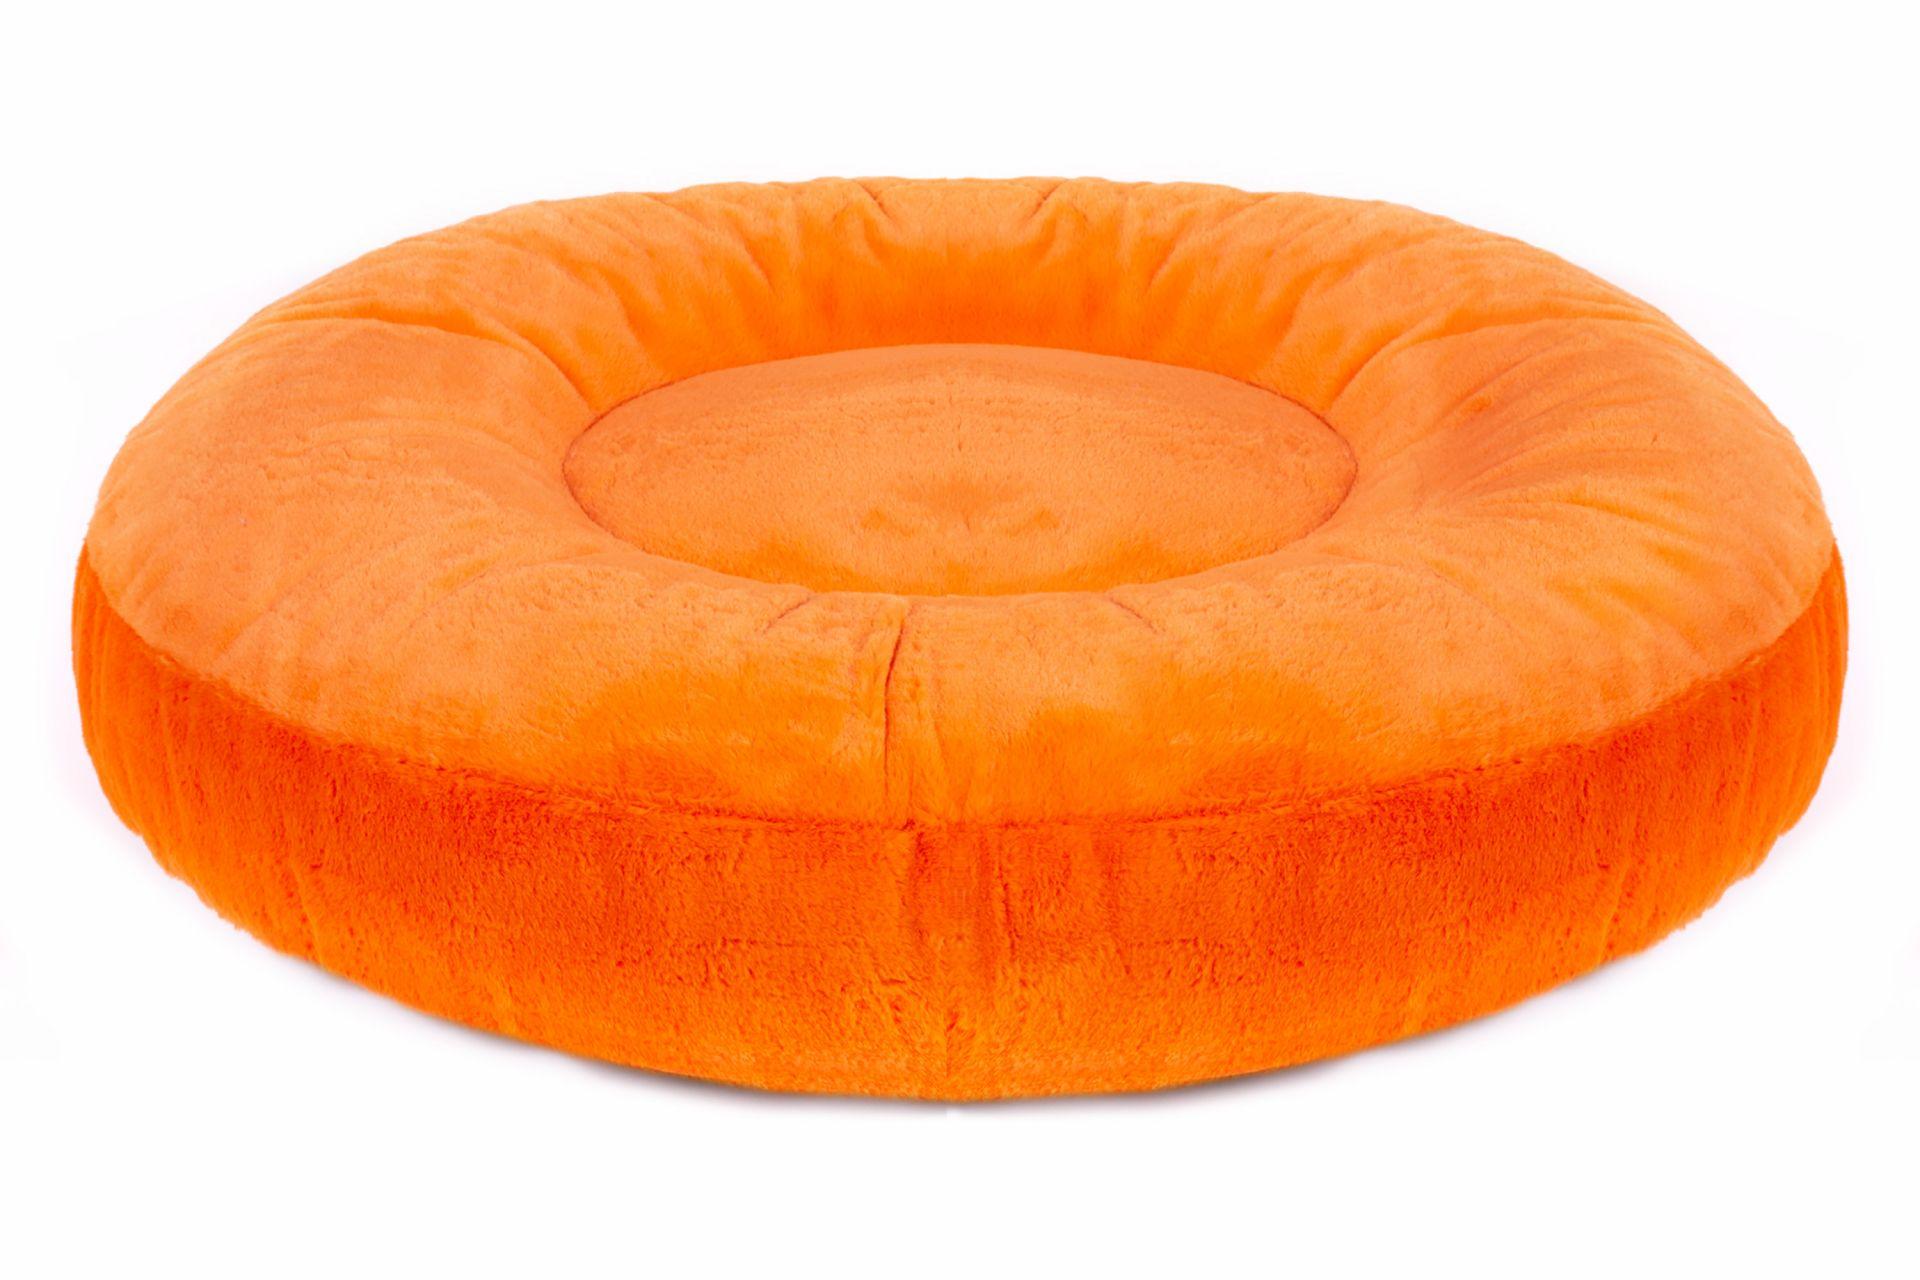 Wau-Donut Orange C